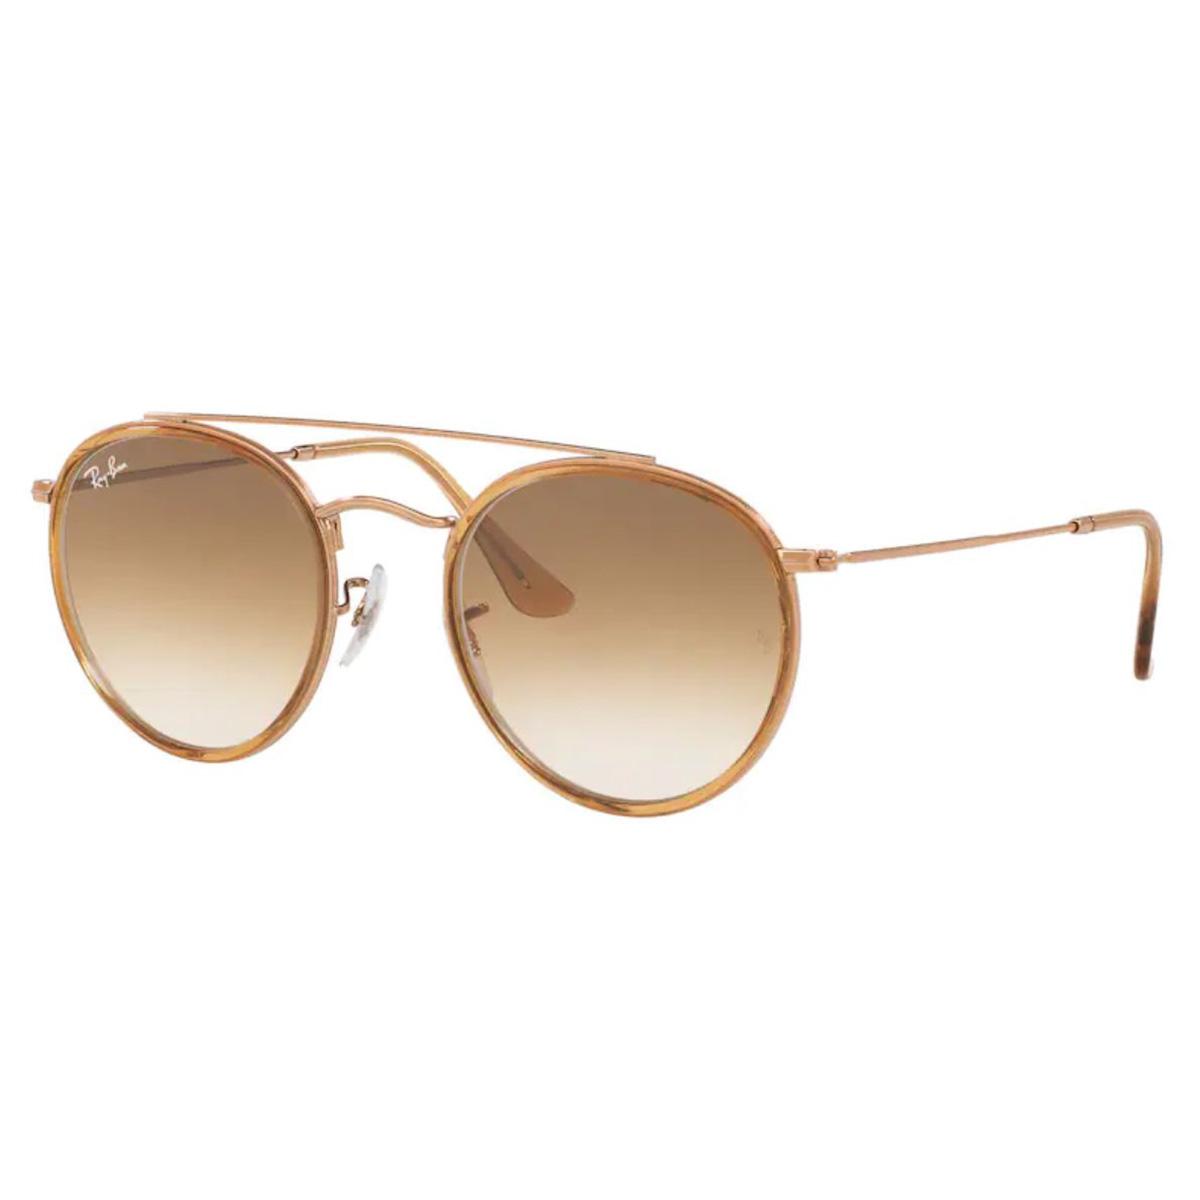 Óculos de Sol RayBan RB3647NL Bronze e Marrom Degrade